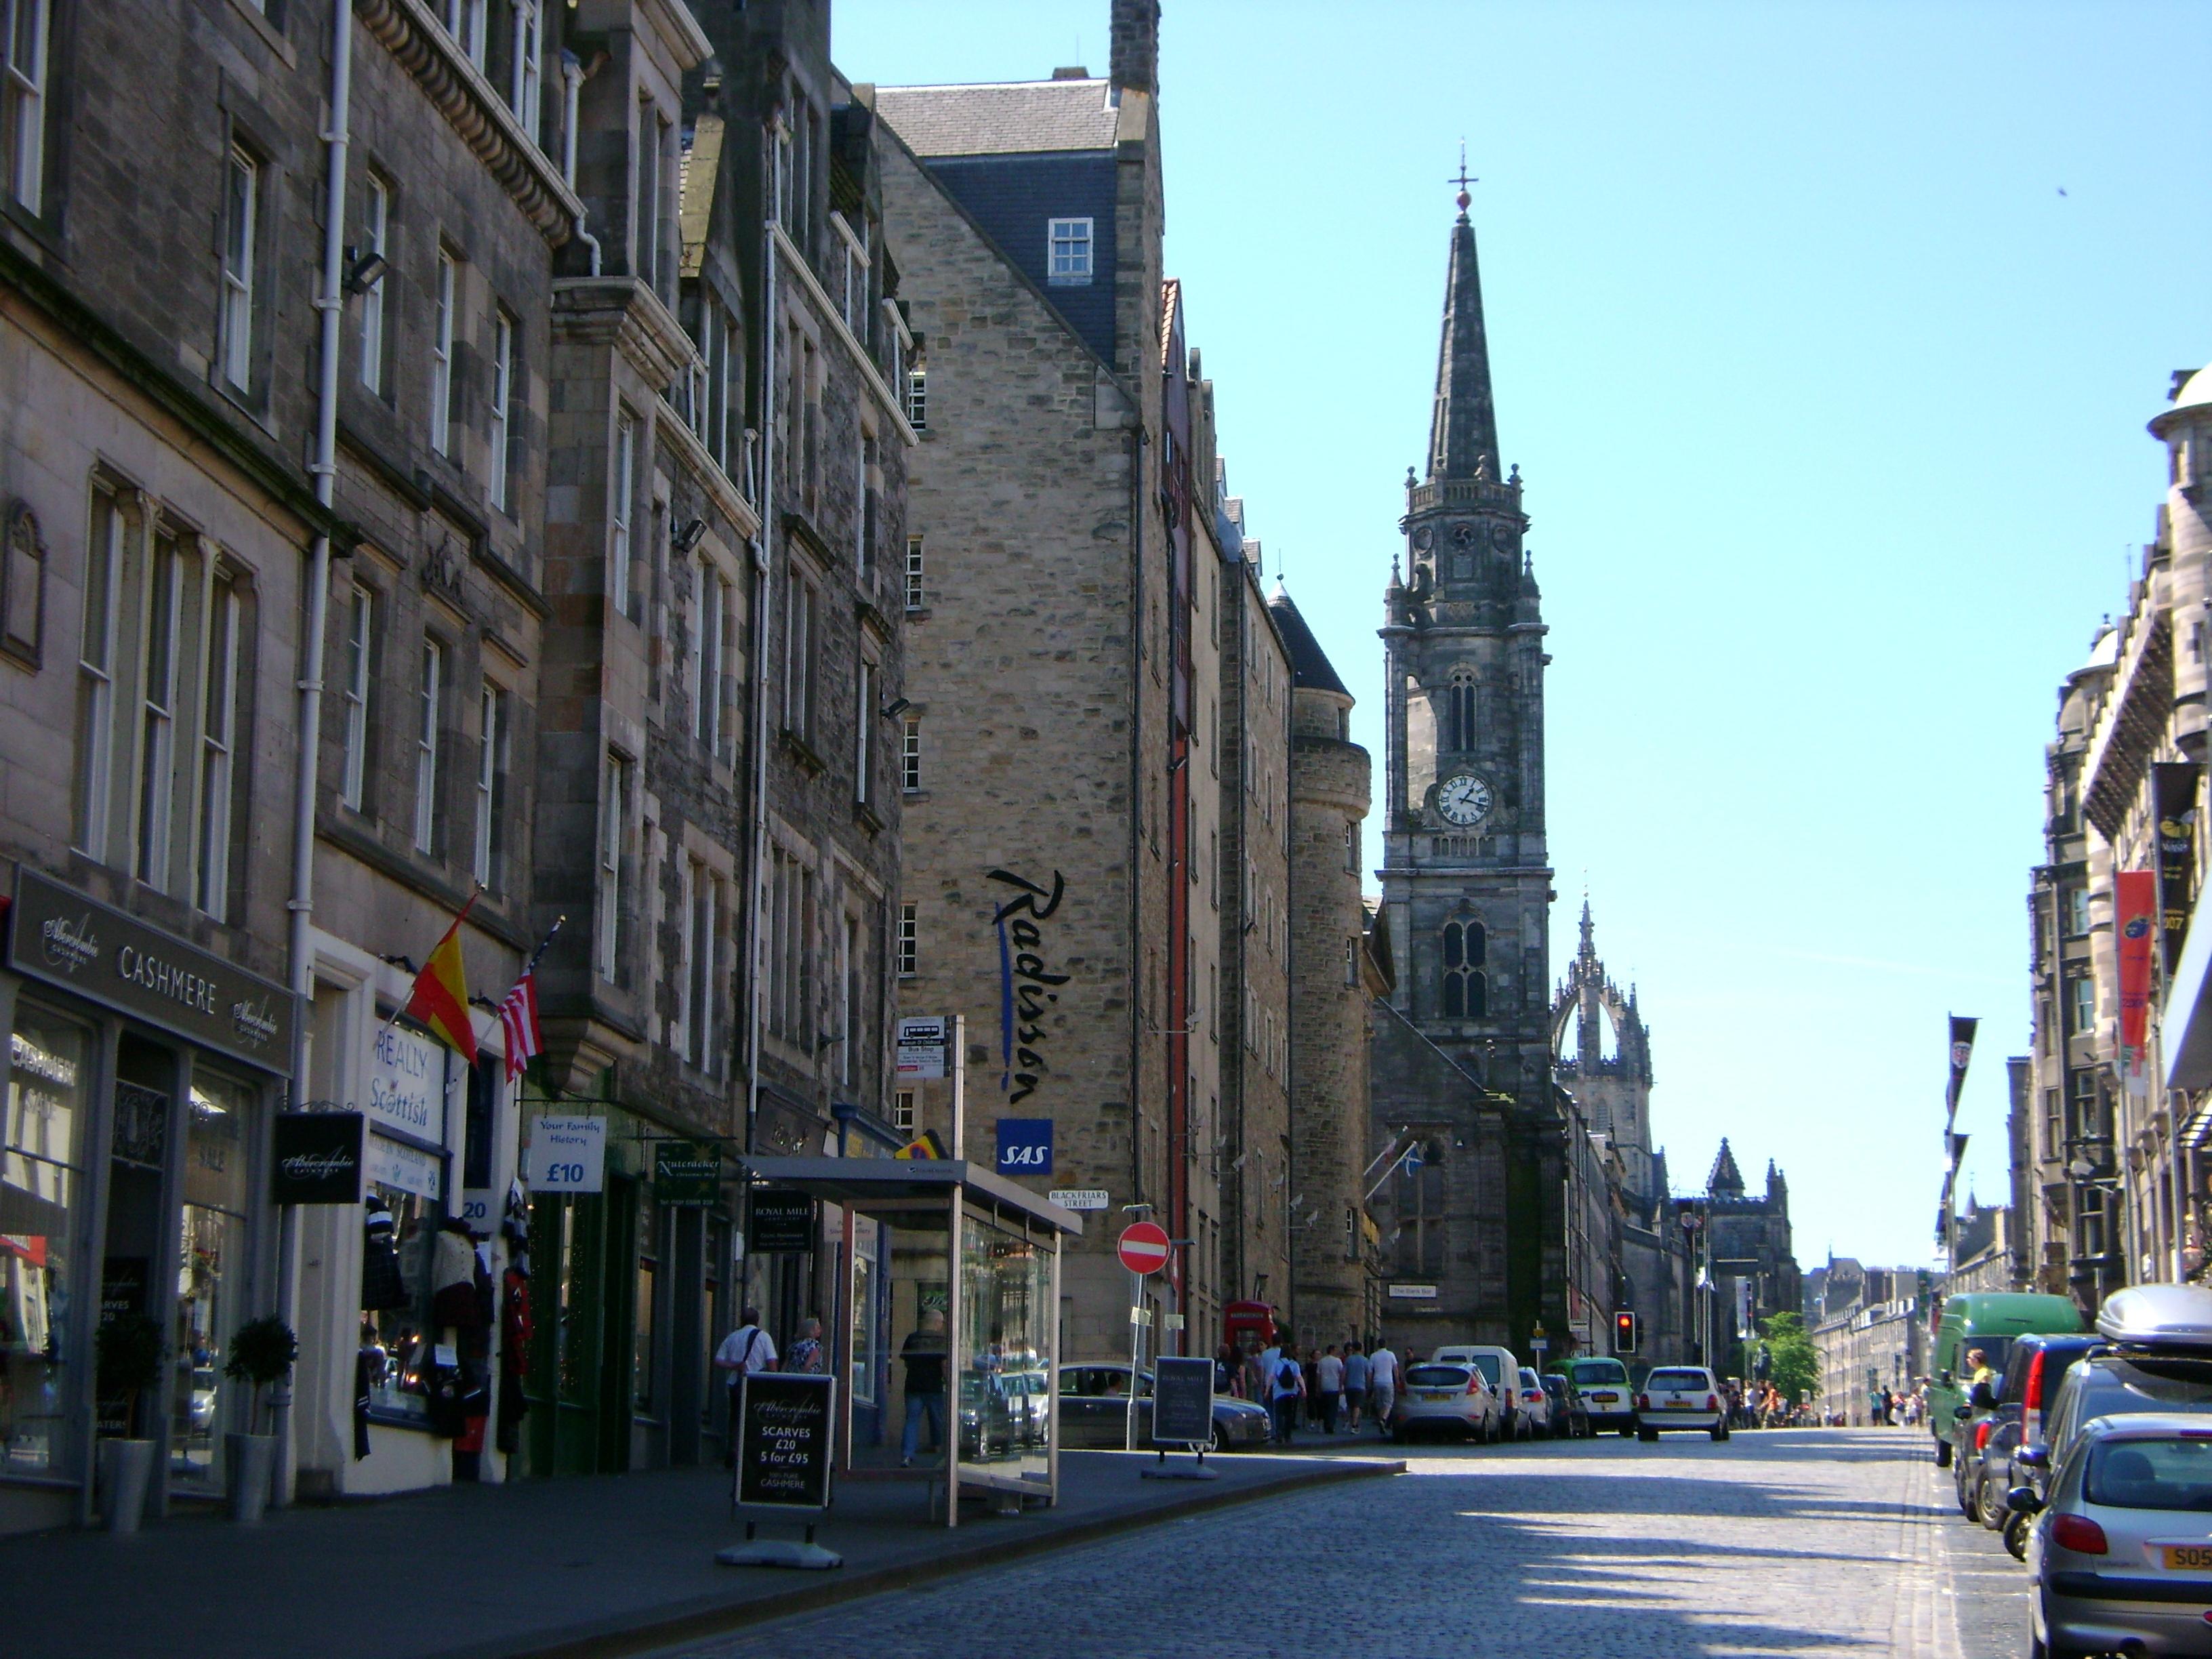 Hd Wallpaper Dimensions File Royal Mile Edinburgh Jpg Wikimedia Commons